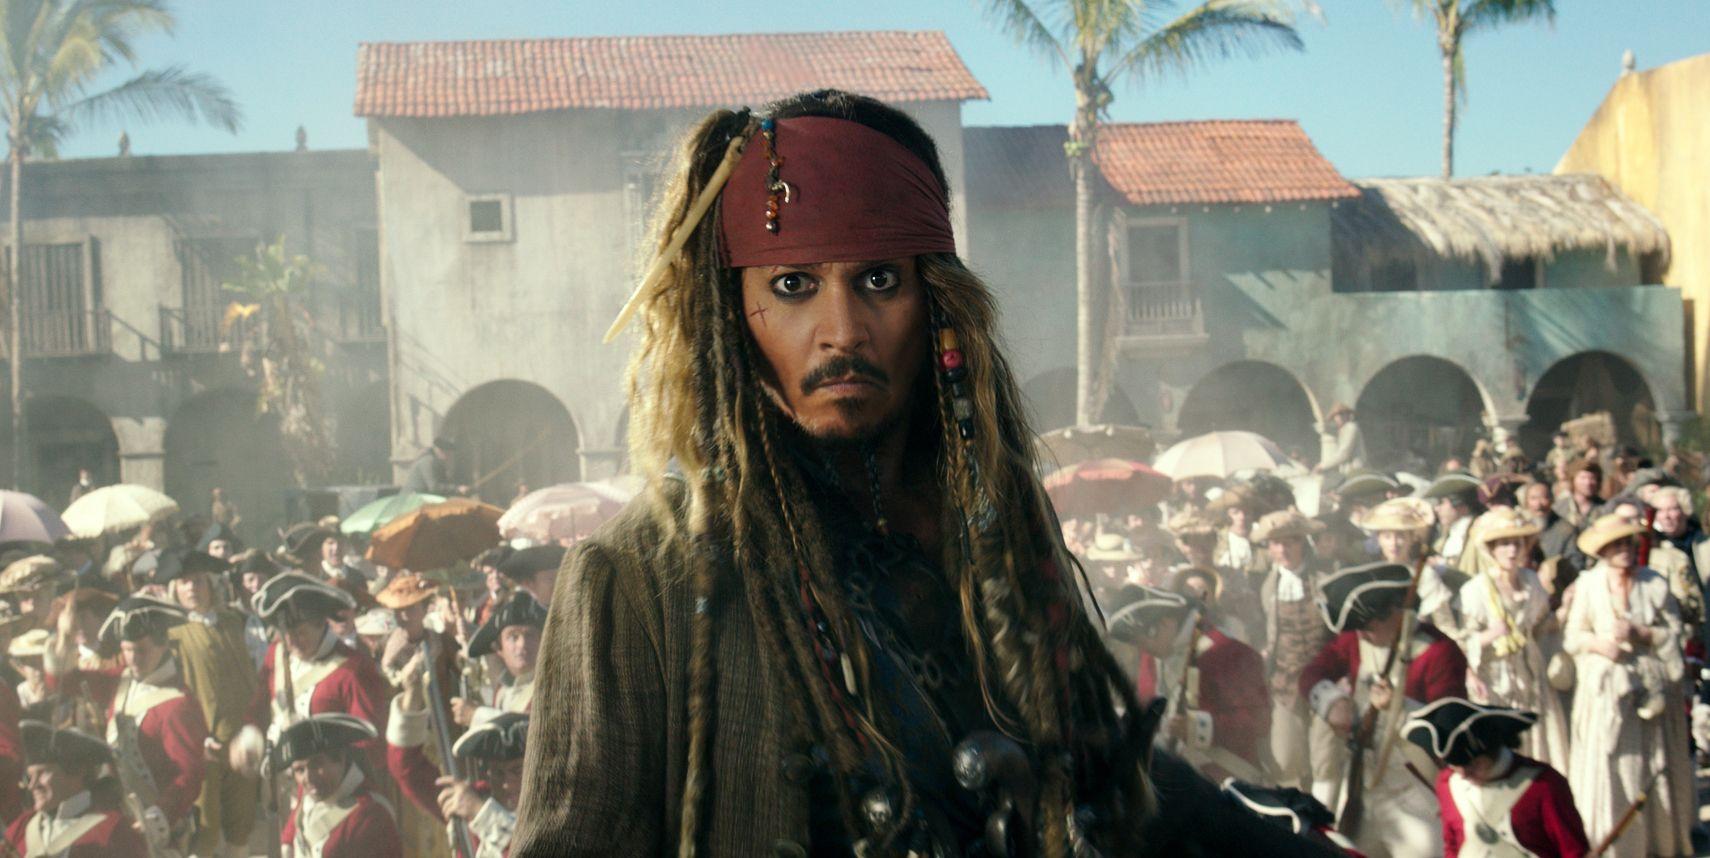 SLAKTES: Johnny Depp i vante gevanter, for femte gang i rollen som kaptein Jack Sparrow. Men den seneste Pirates of the Caribbean-filmen går hard medfart i USA. Foto: DISNEY/AP